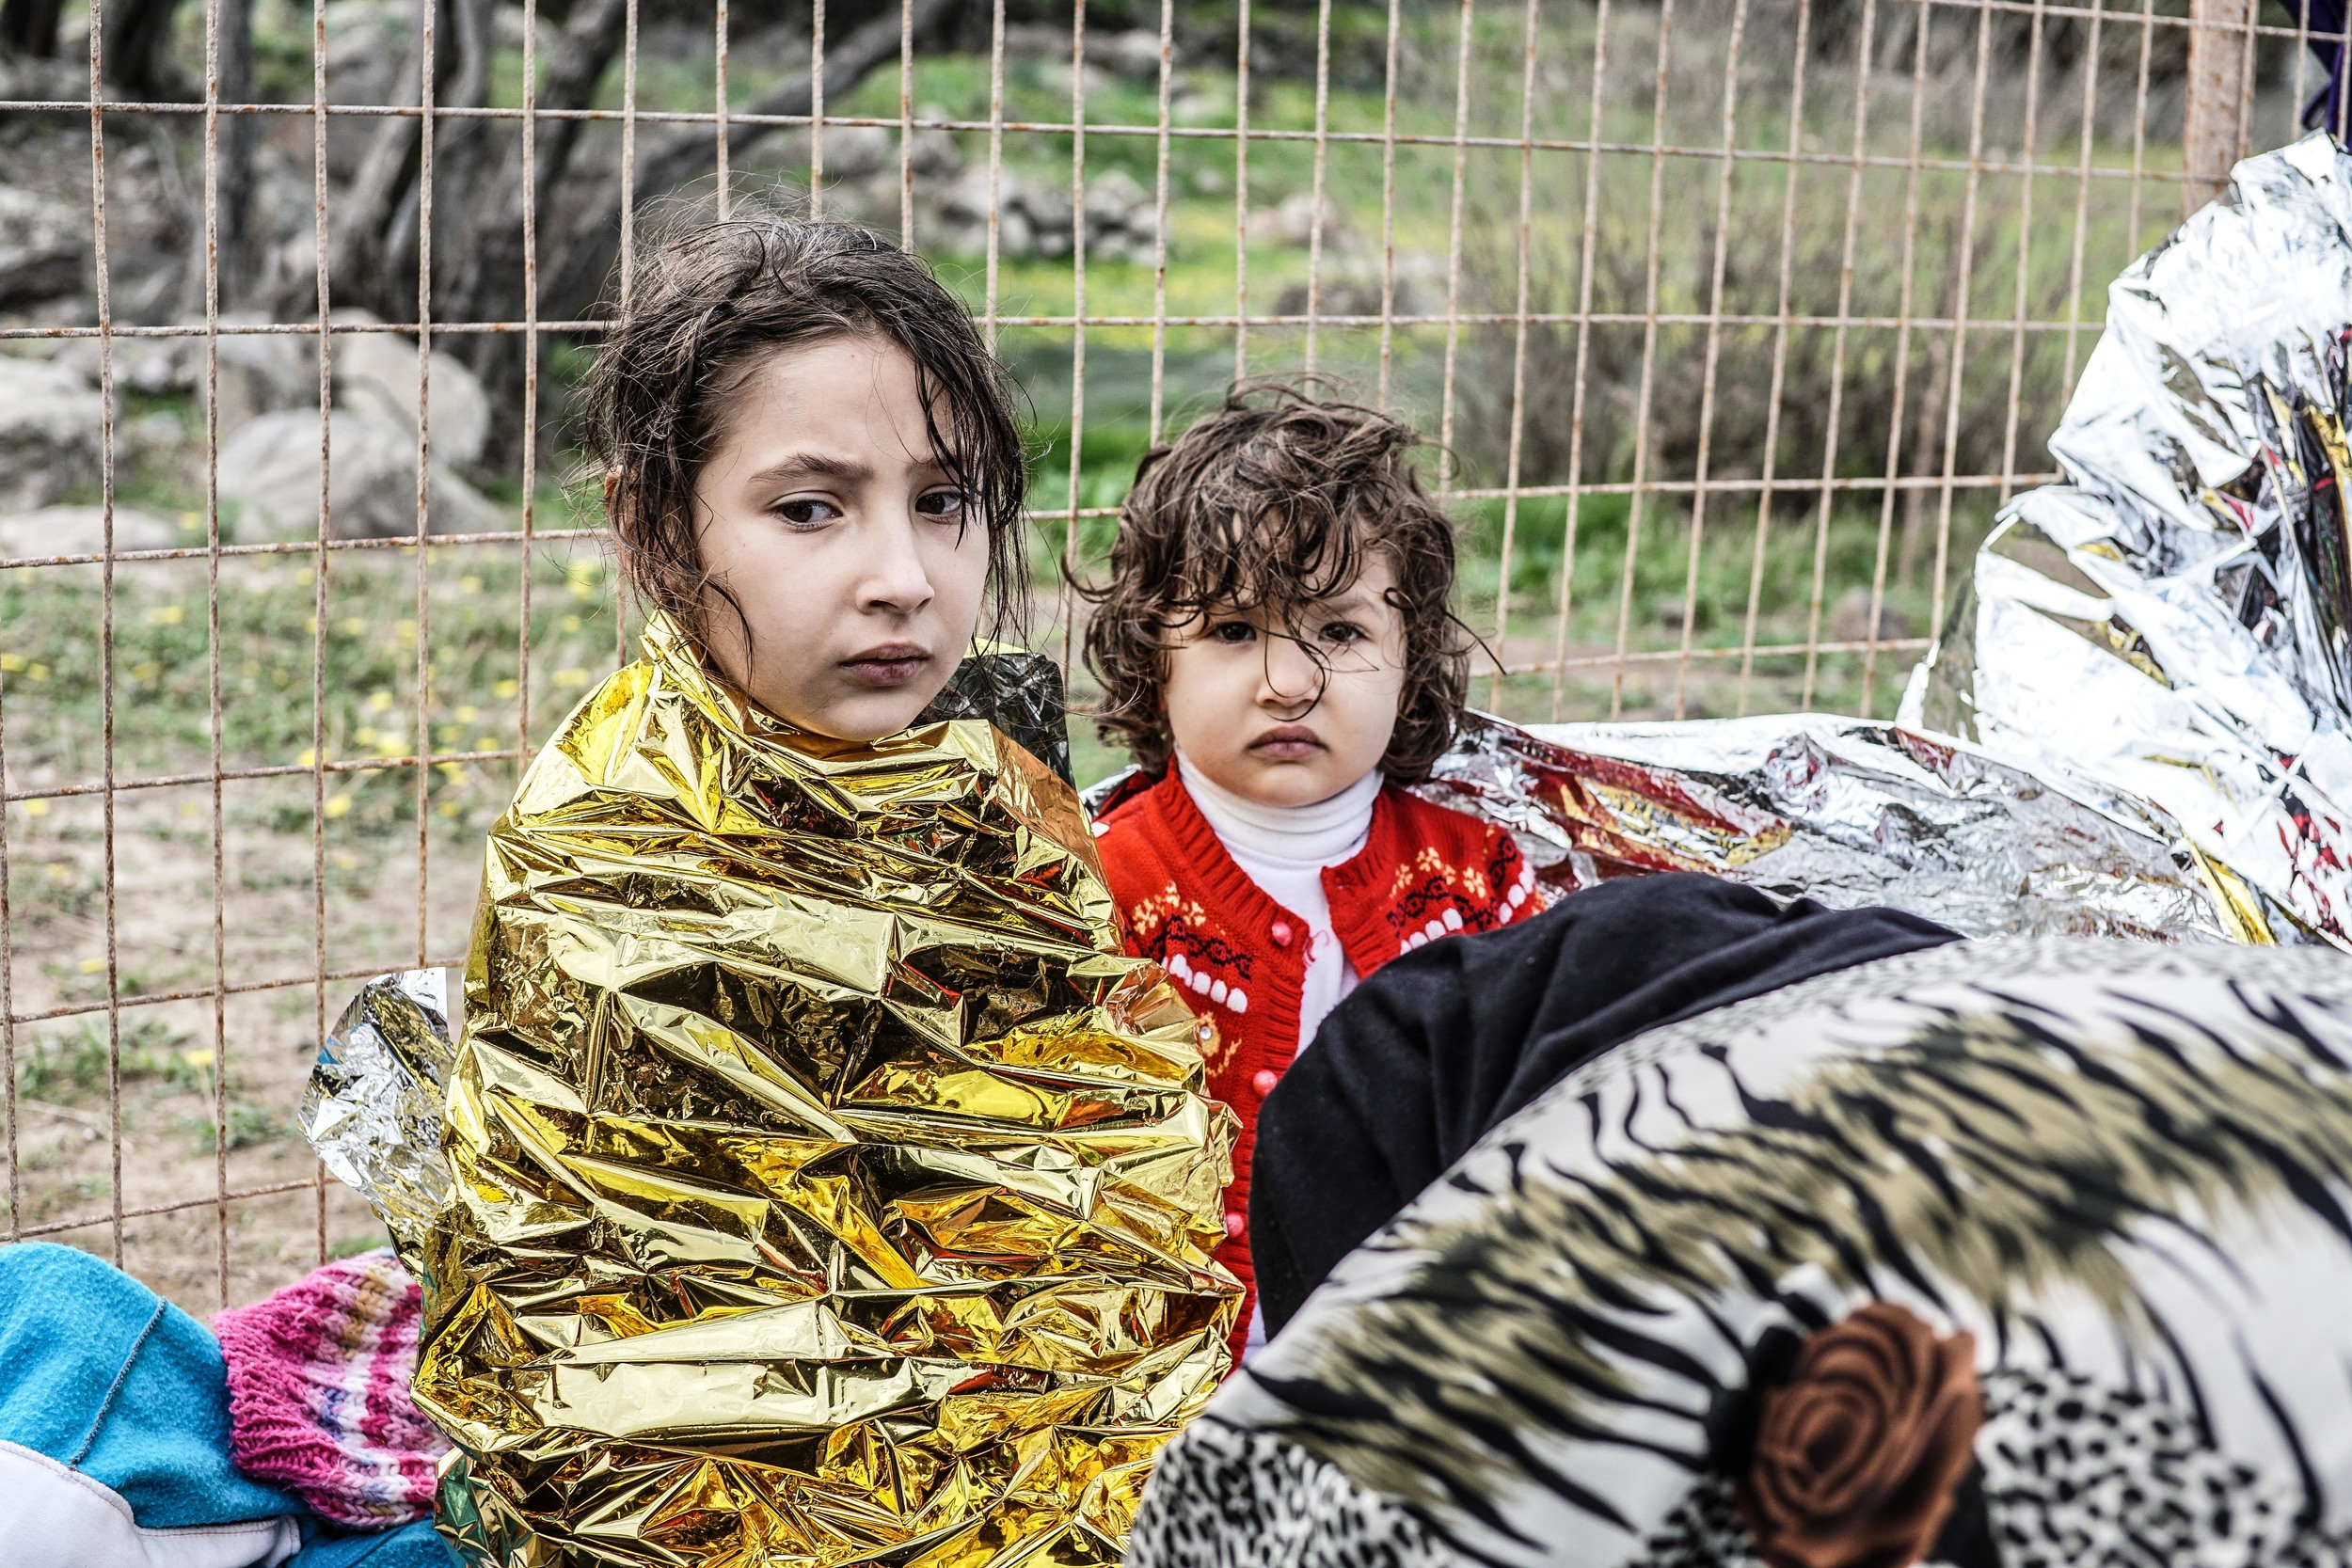 Syrian Refugee Crisis Lesbos Greece November 2015 7.jpg